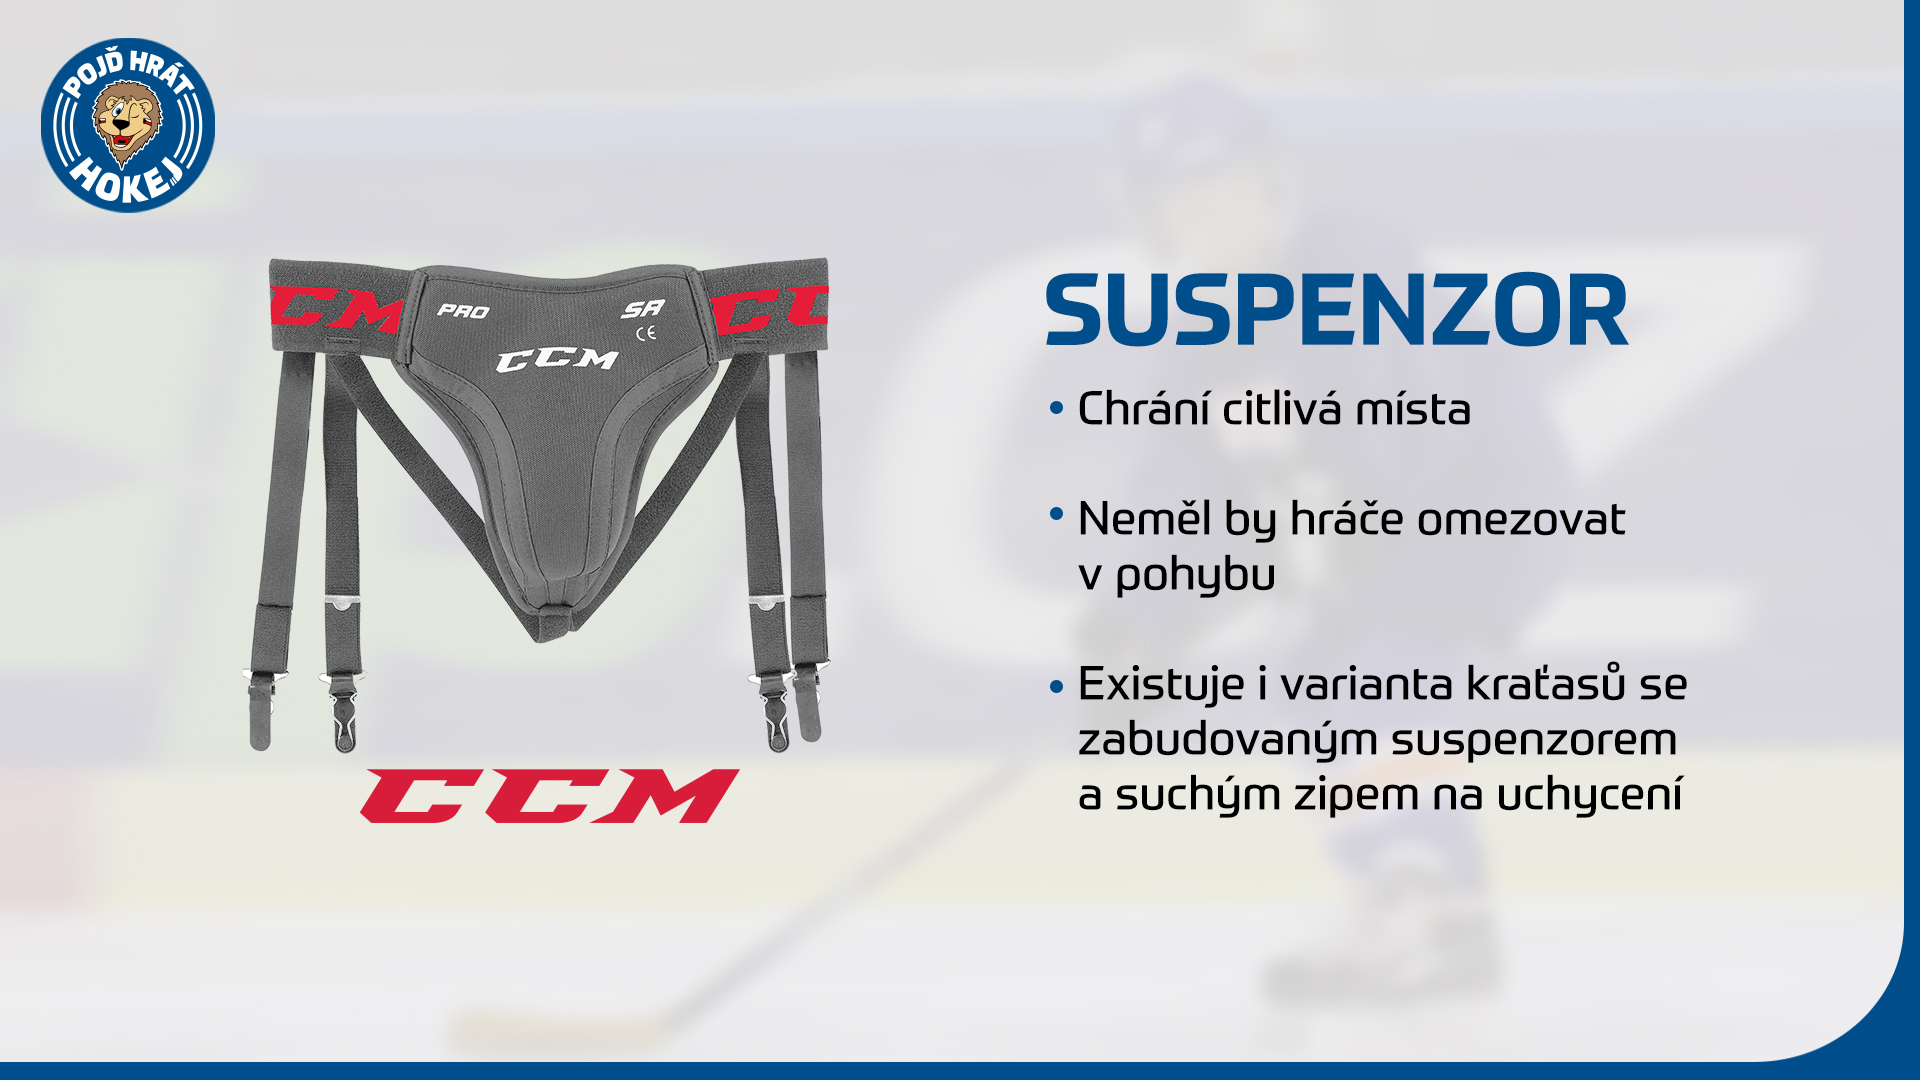 Suspensor.jpg